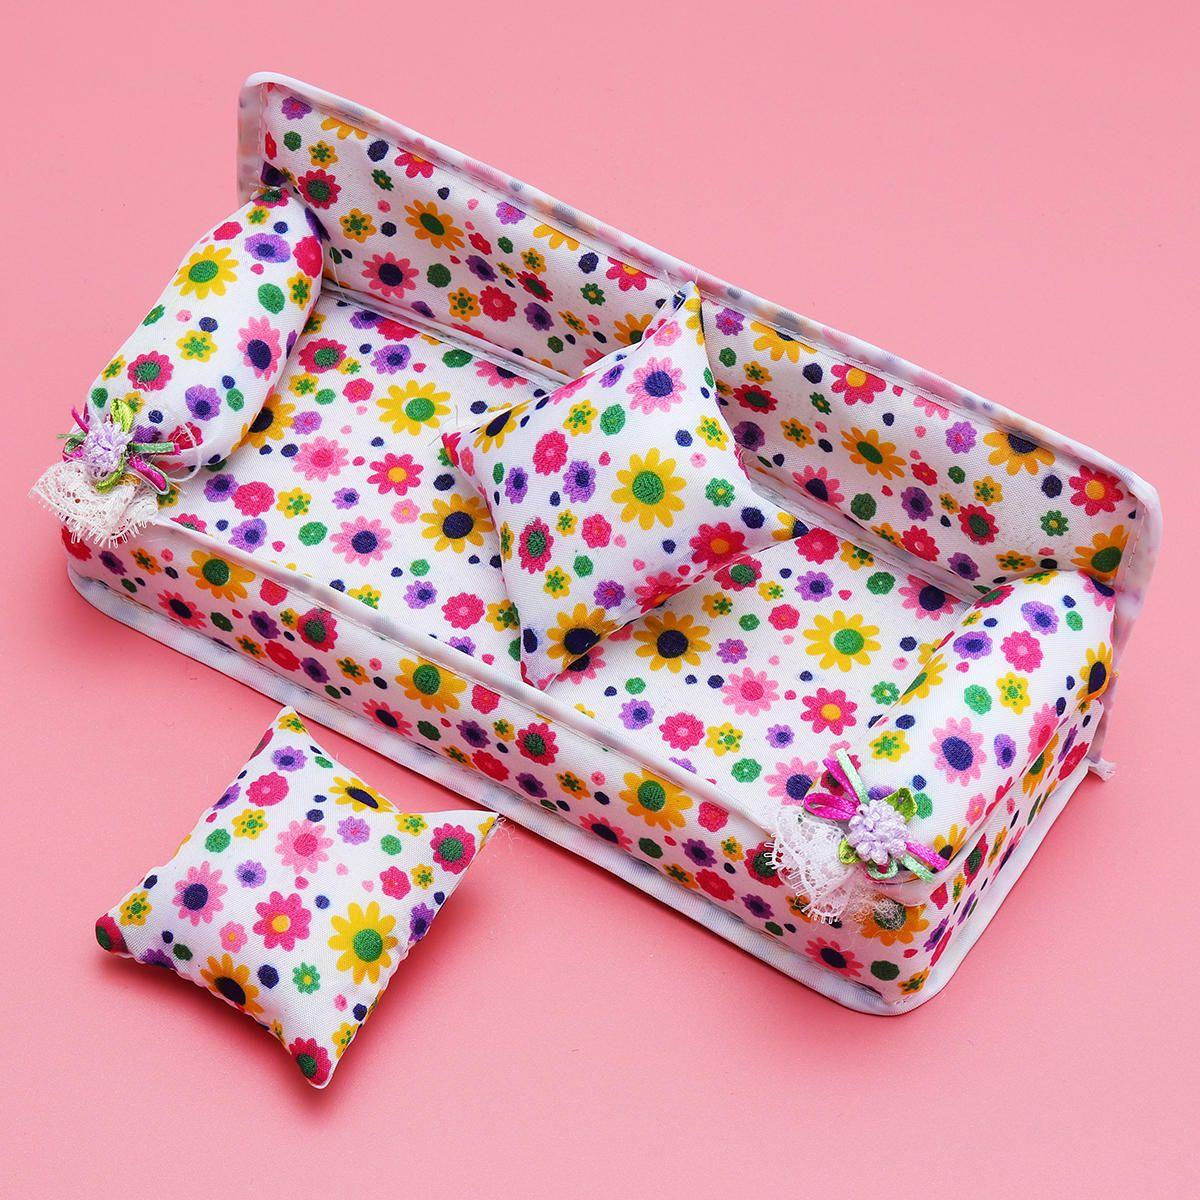 IZZ US$10.38 DIY Plastic Doll House Kids Development Toys Furniture Living Room Sofa Bed Dressing Table Hanger Set